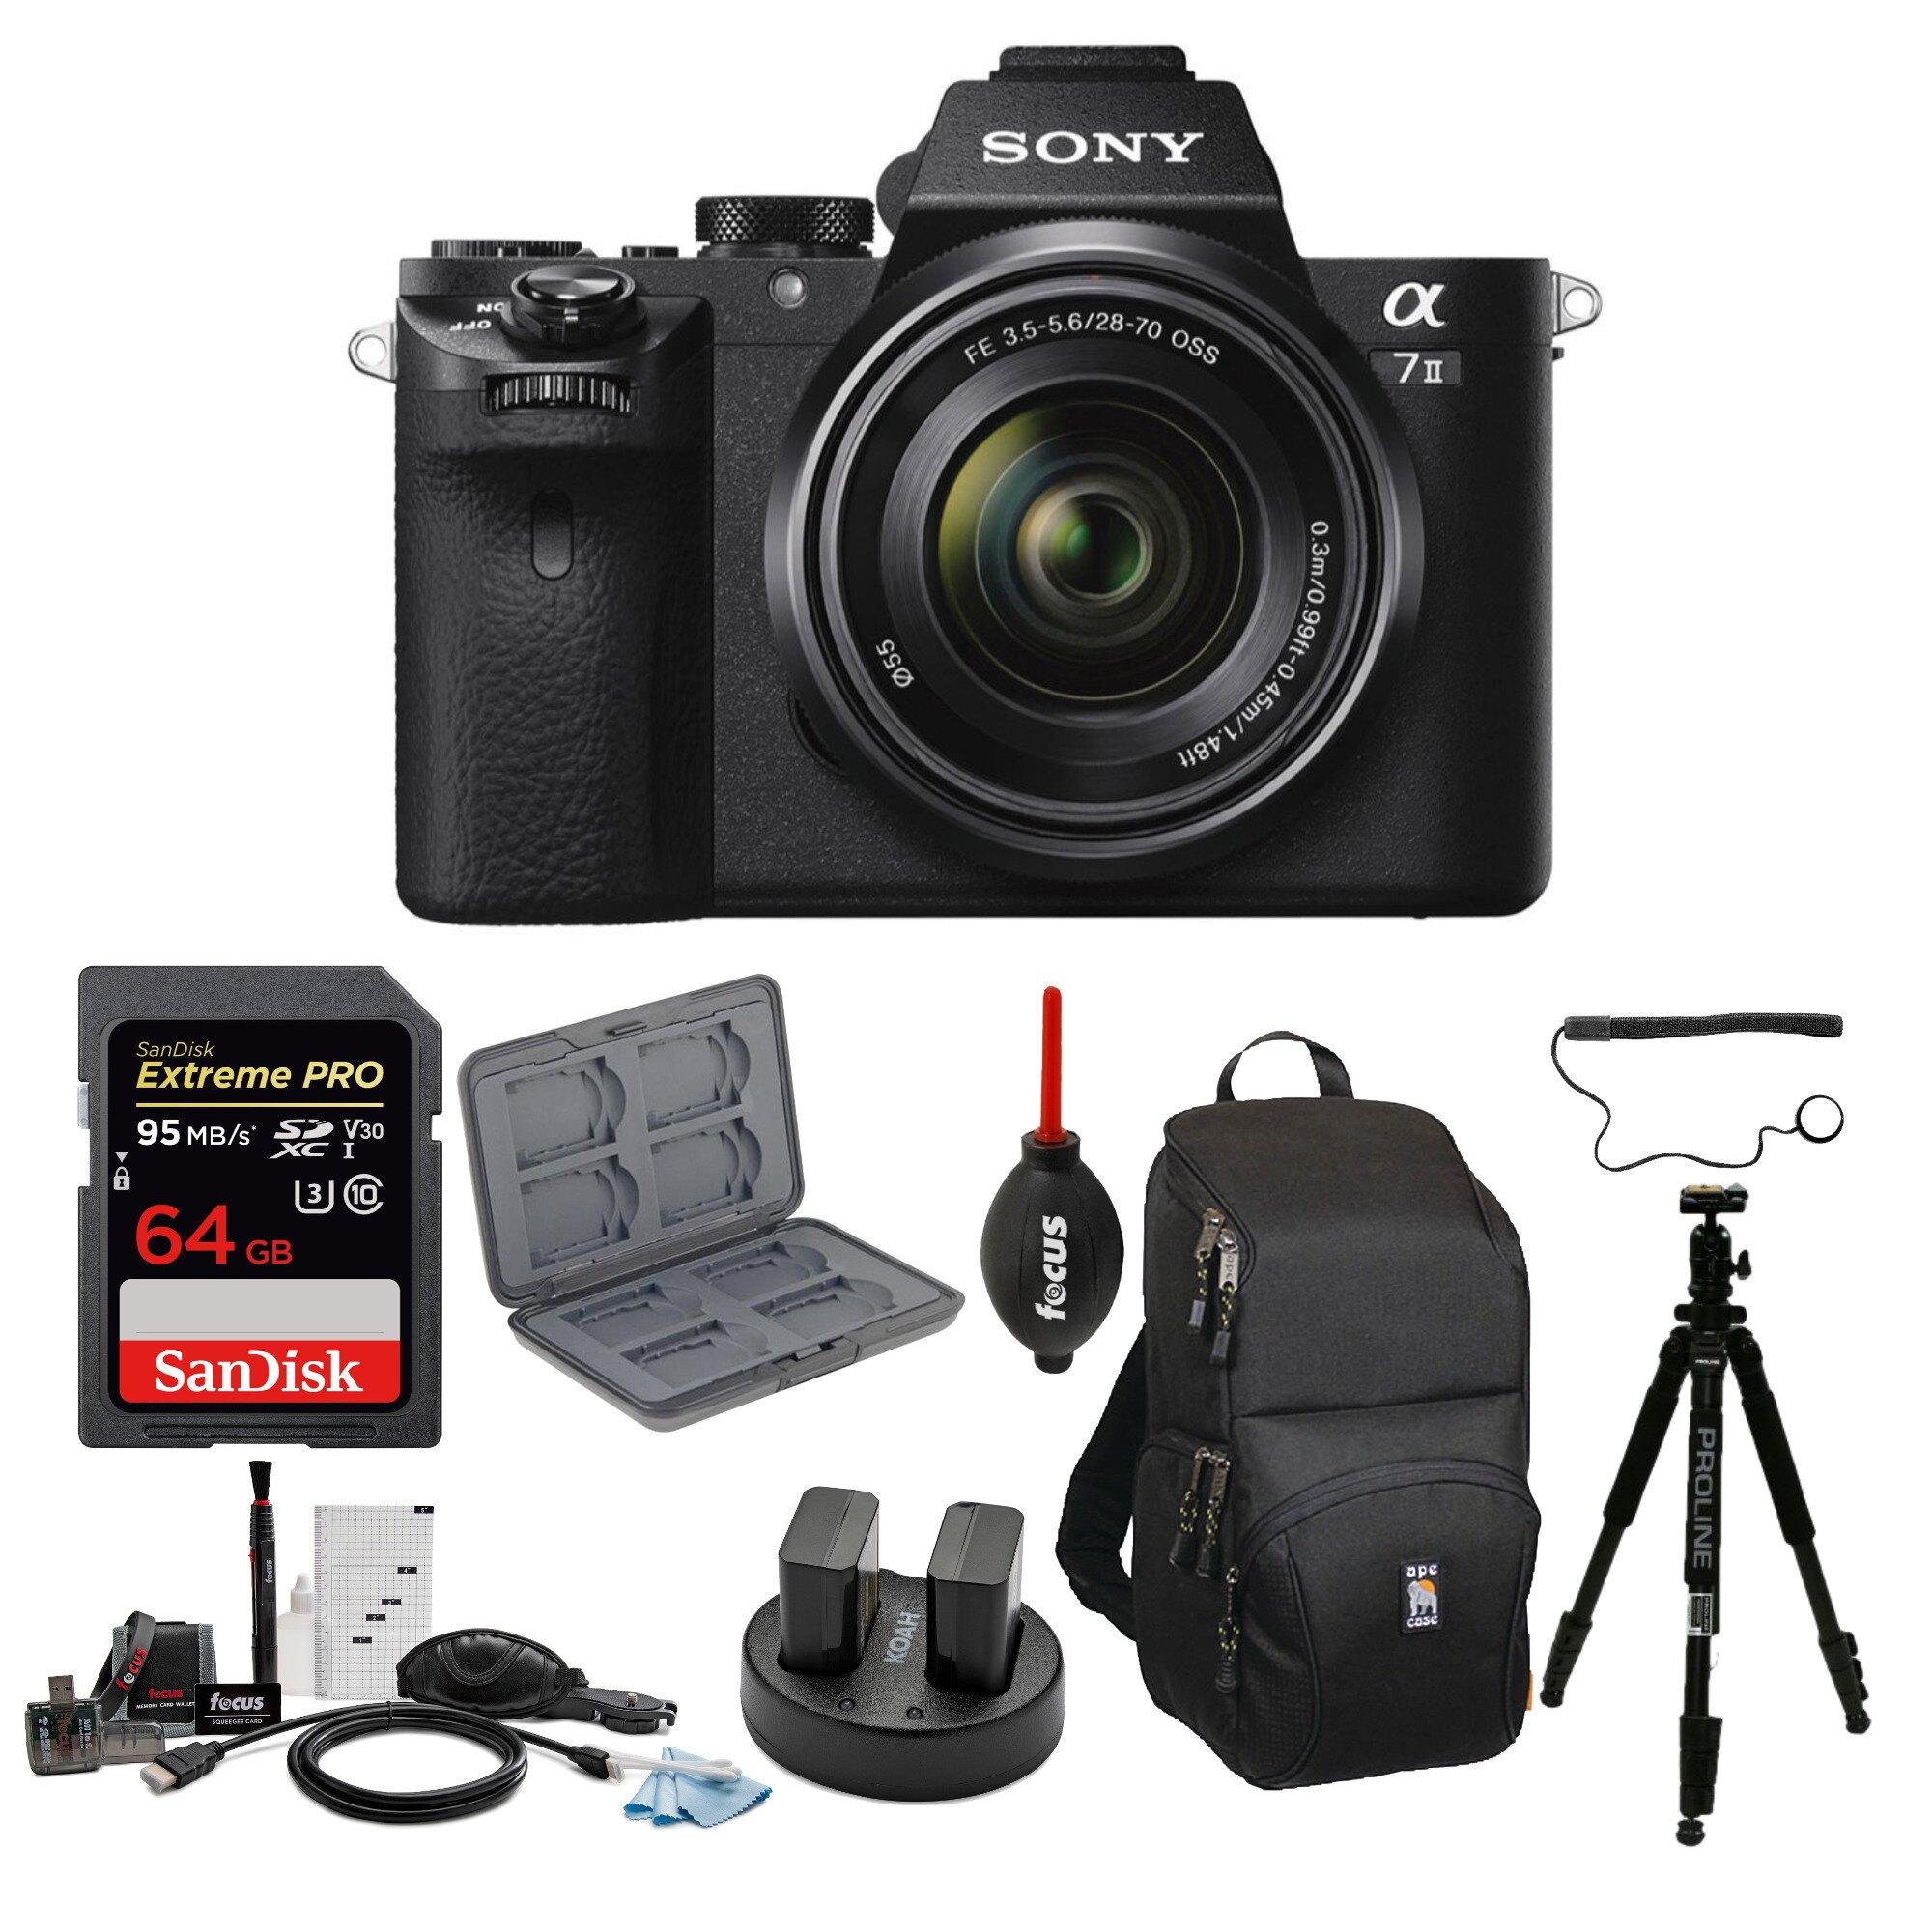 Sony Alpha A7ii Mirrorless Camera With 28-70mm Lens And 64gb Card Bundle (Black) : $939.99  AC + FS